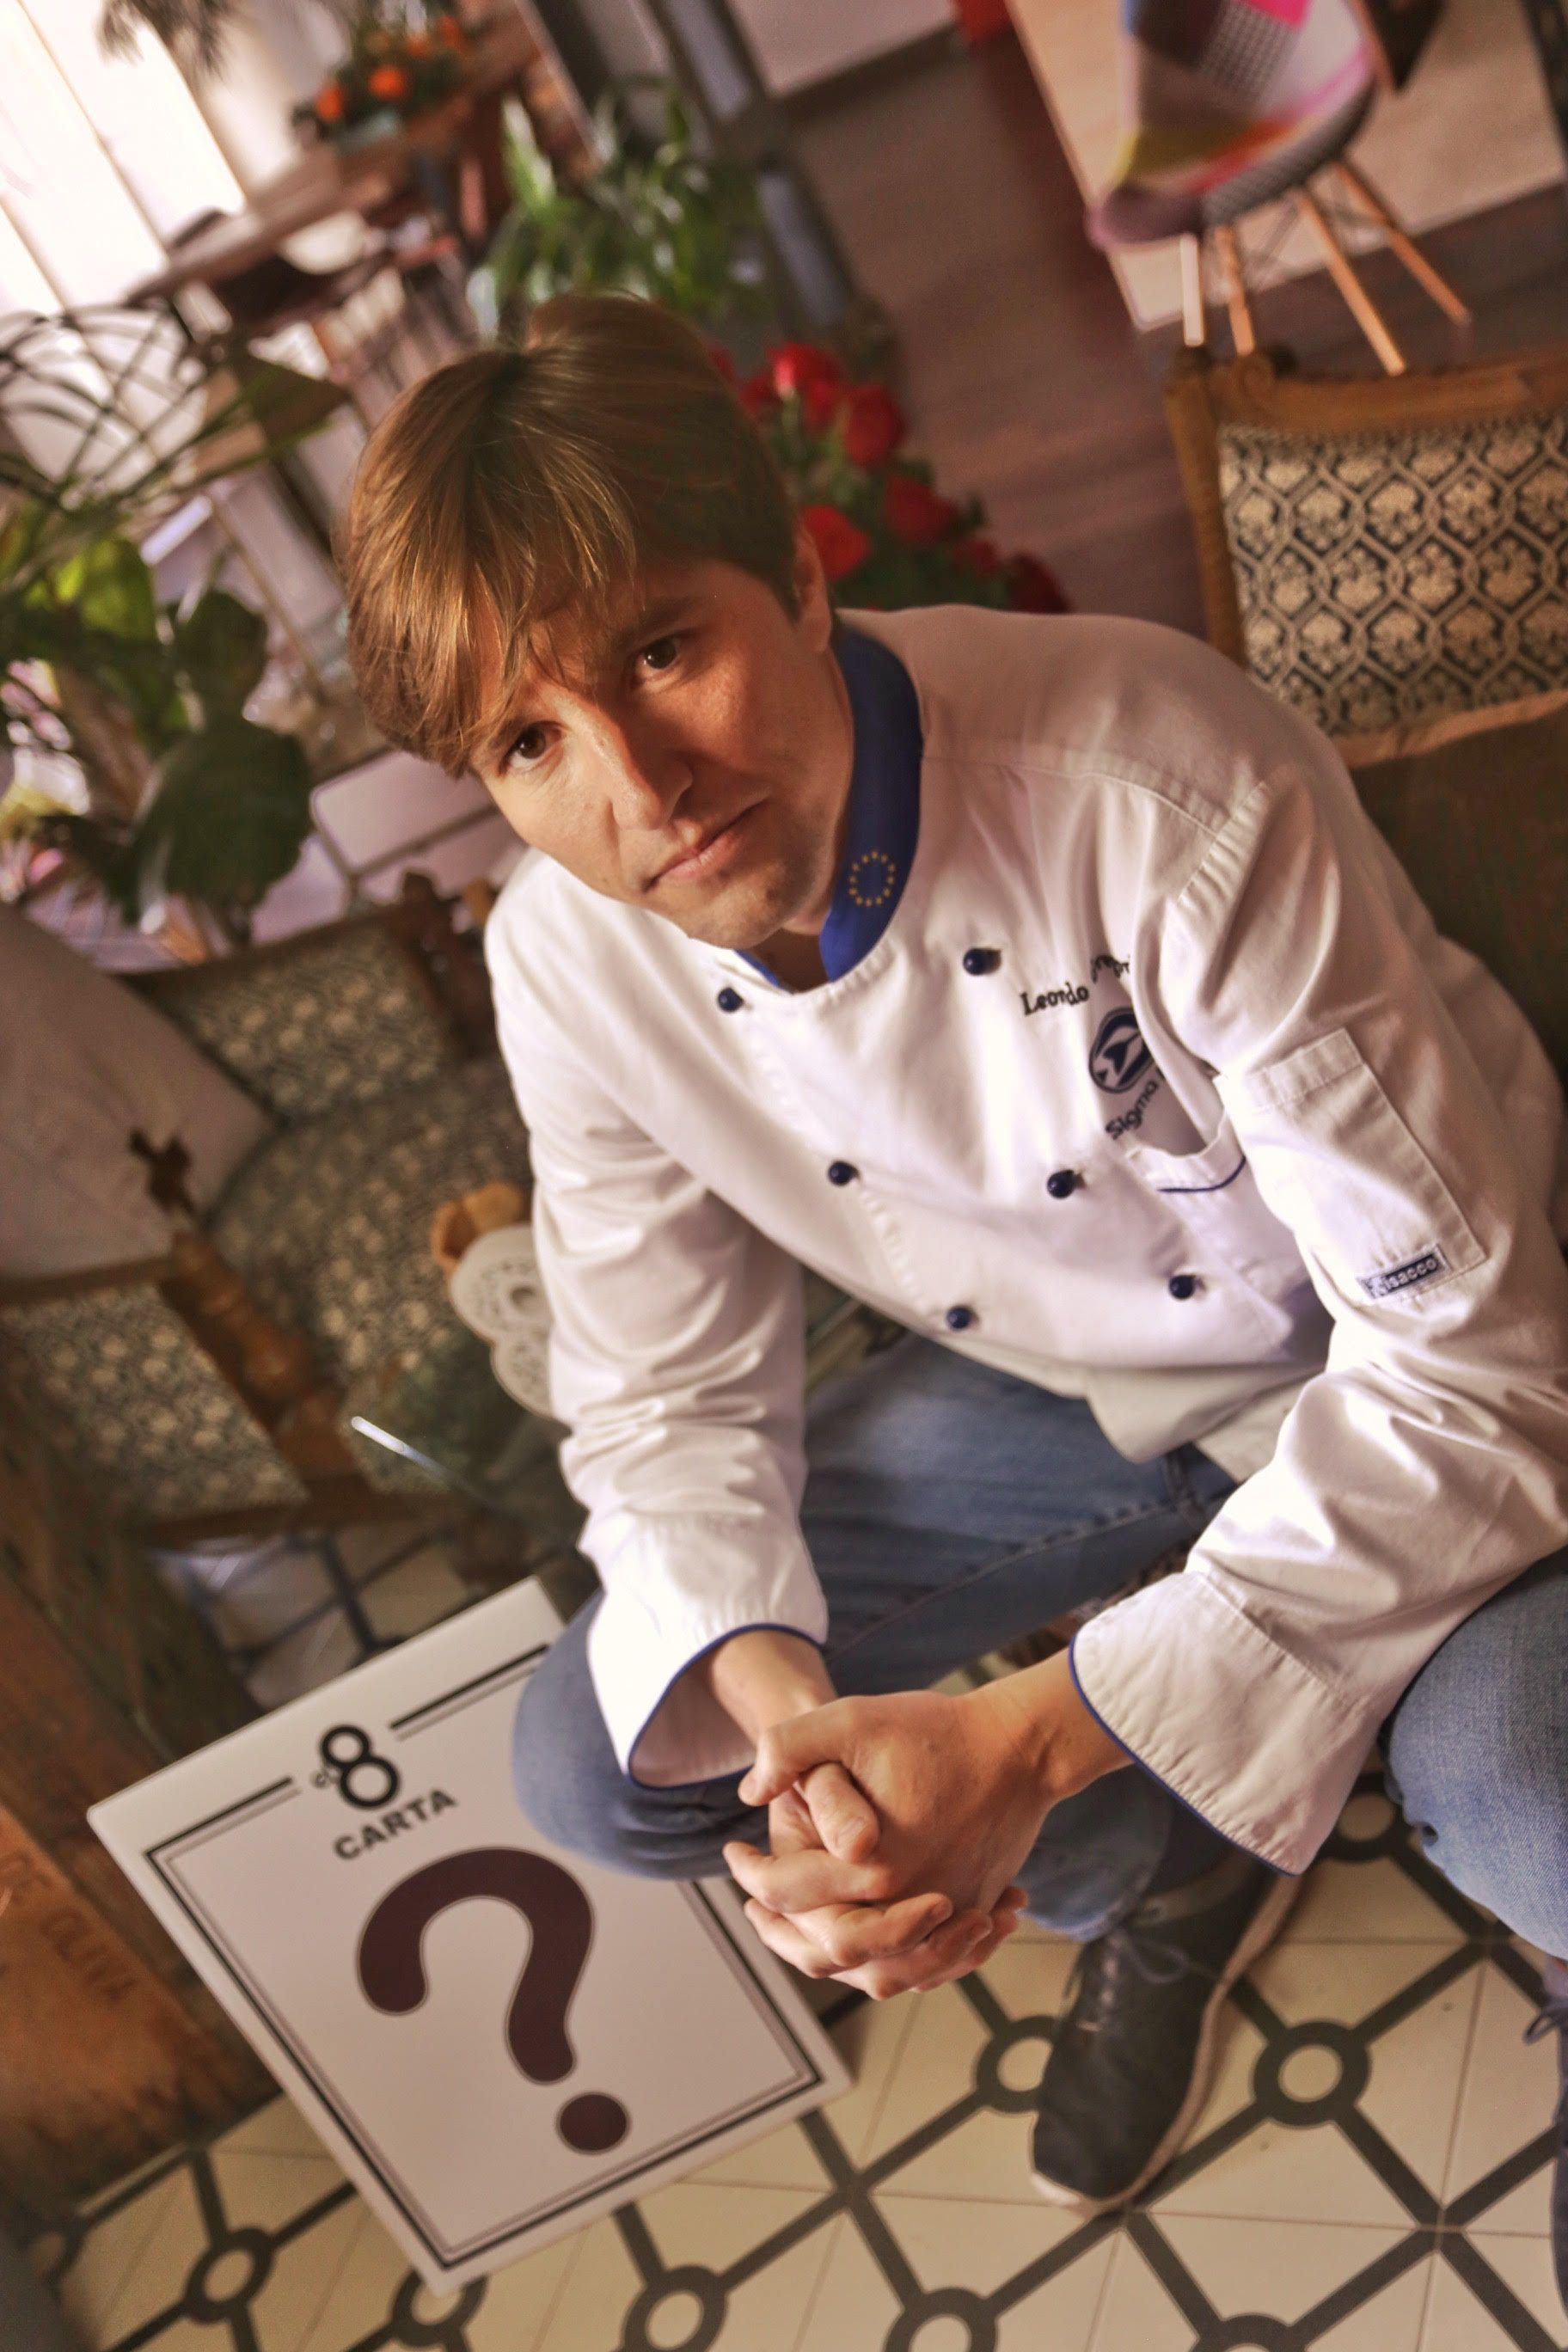 Fotografia El chef murciano Leonardo Gregorio Crespo.